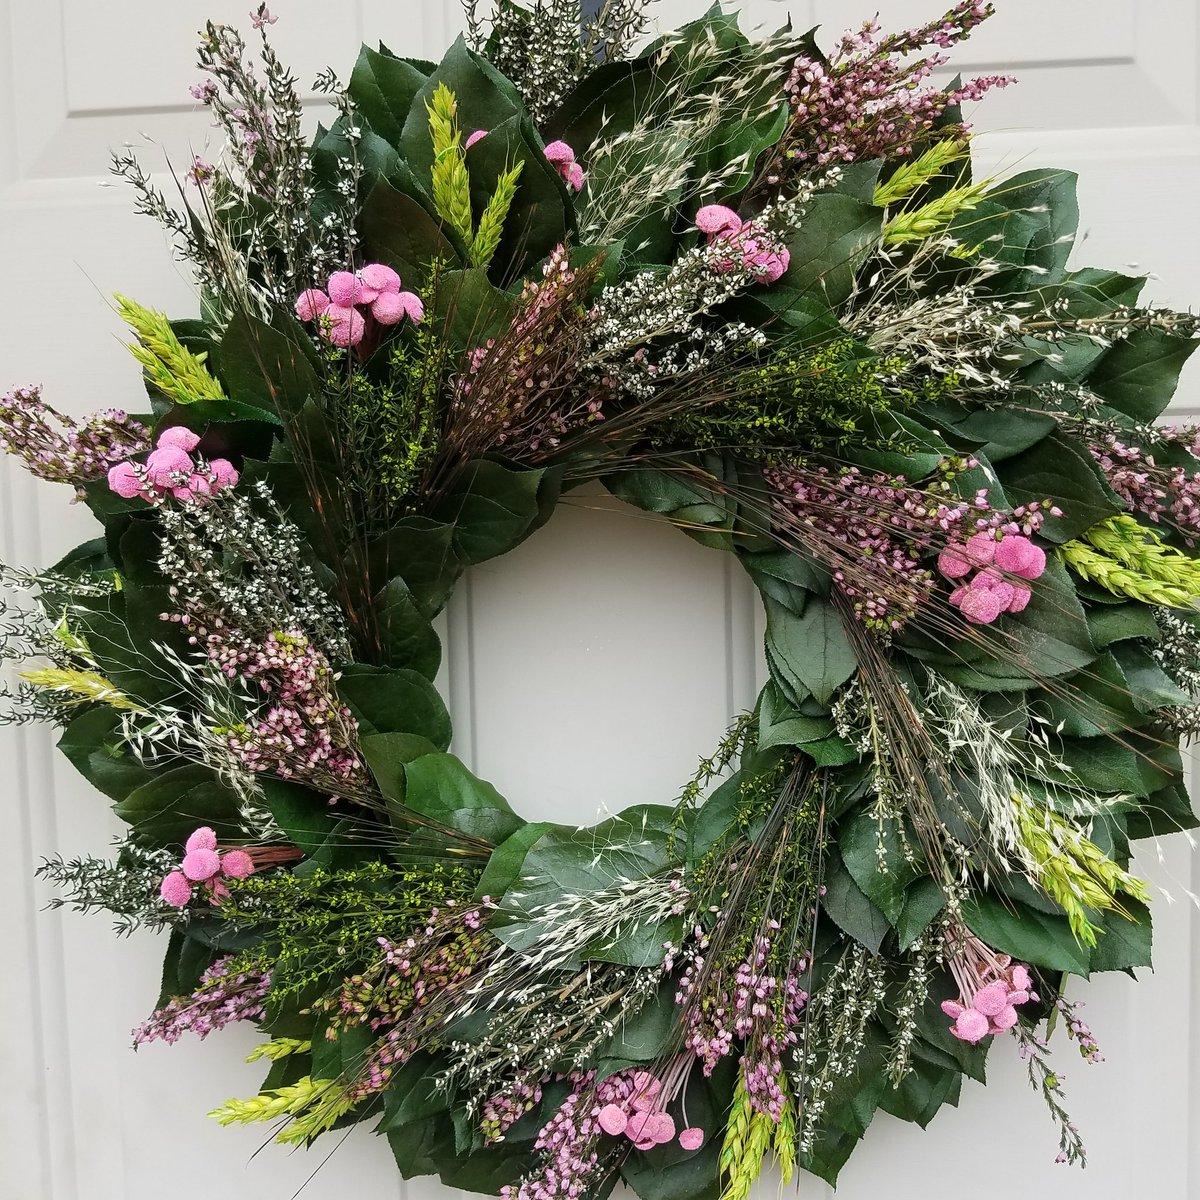 Spring natural preserved wreath #eucalyptuswreath #pinkwreath #mothersday #momgift<br>http://pic.twitter.com/umklSAvUXO